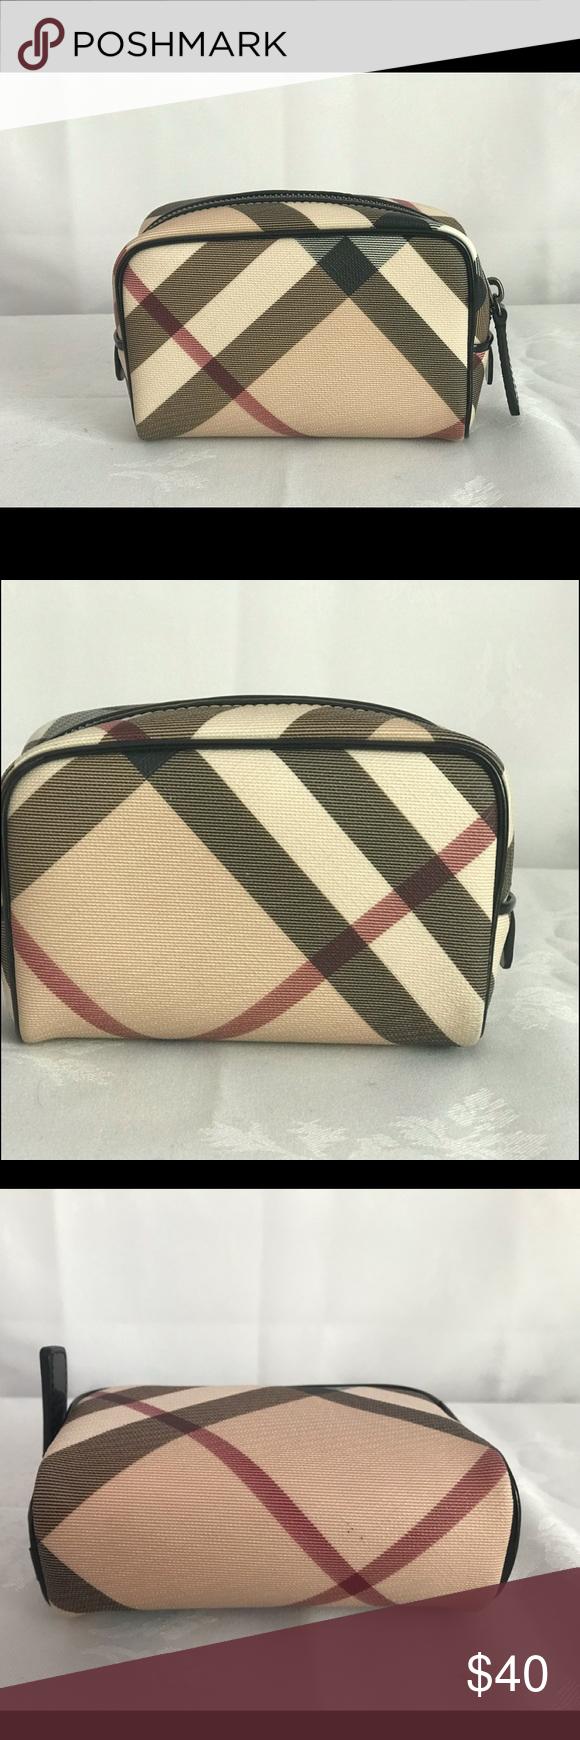 Burberry Tan Plaid Cosmetic Bag Cosmetic bag circa 2009